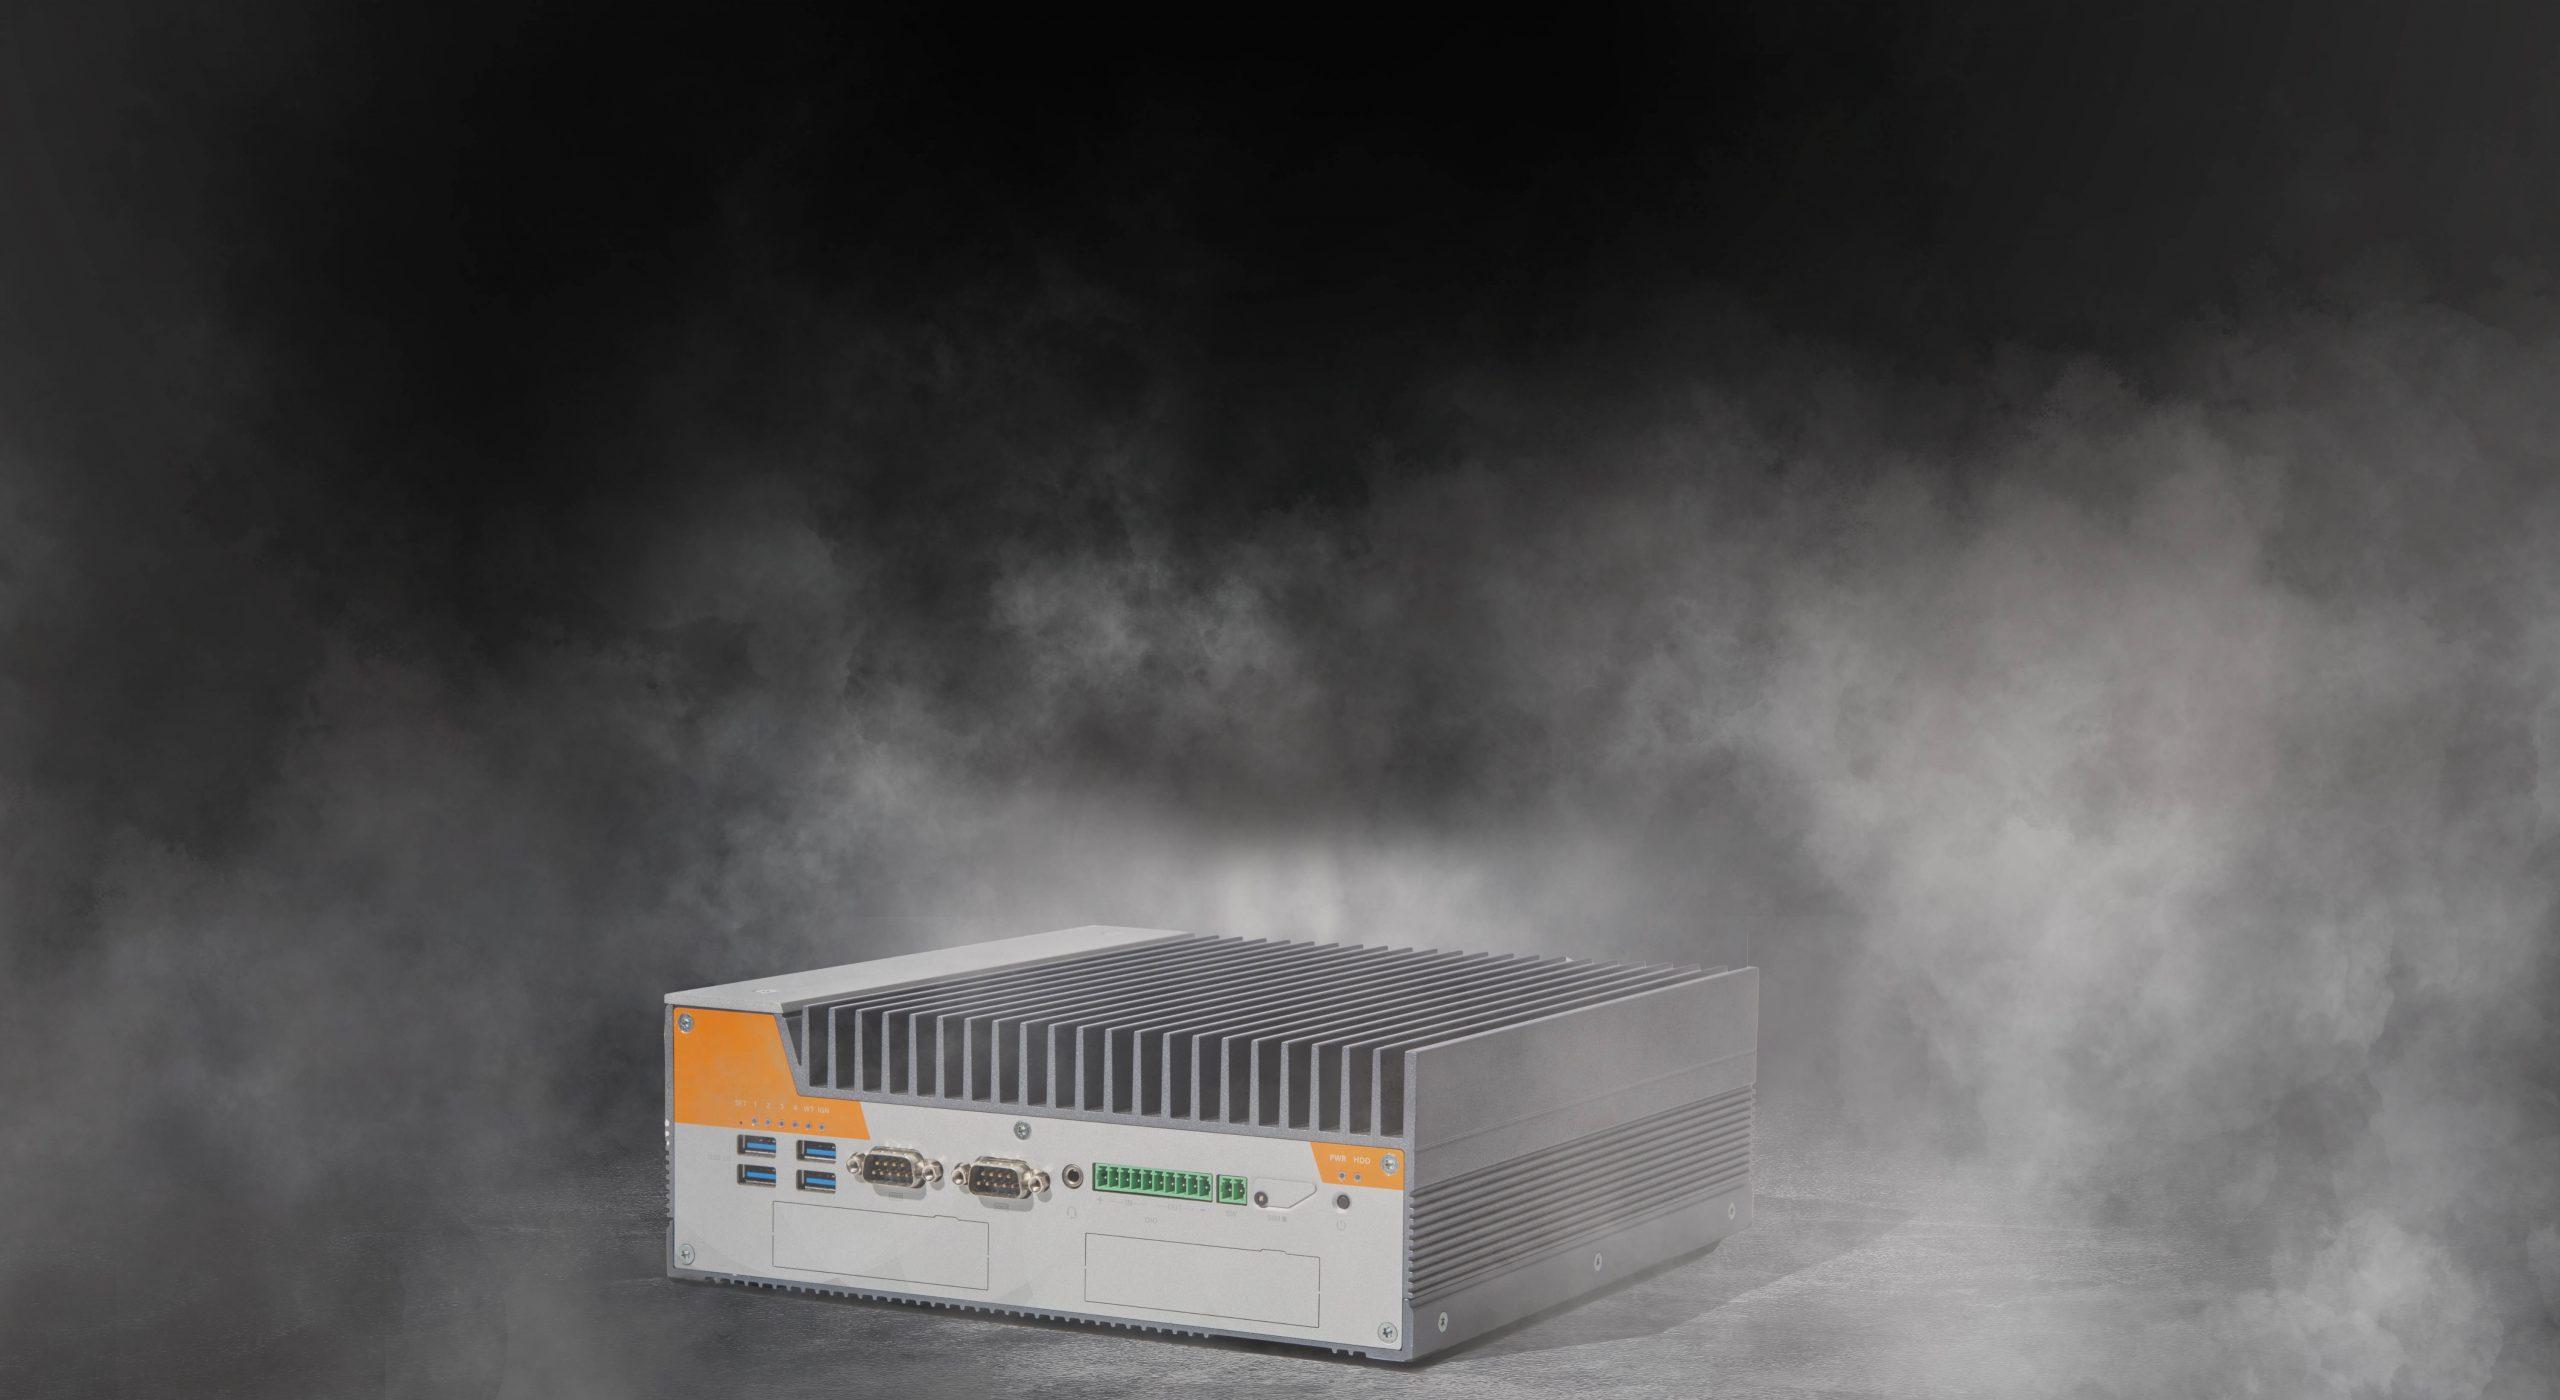 Karbon K700 pictured in the fog